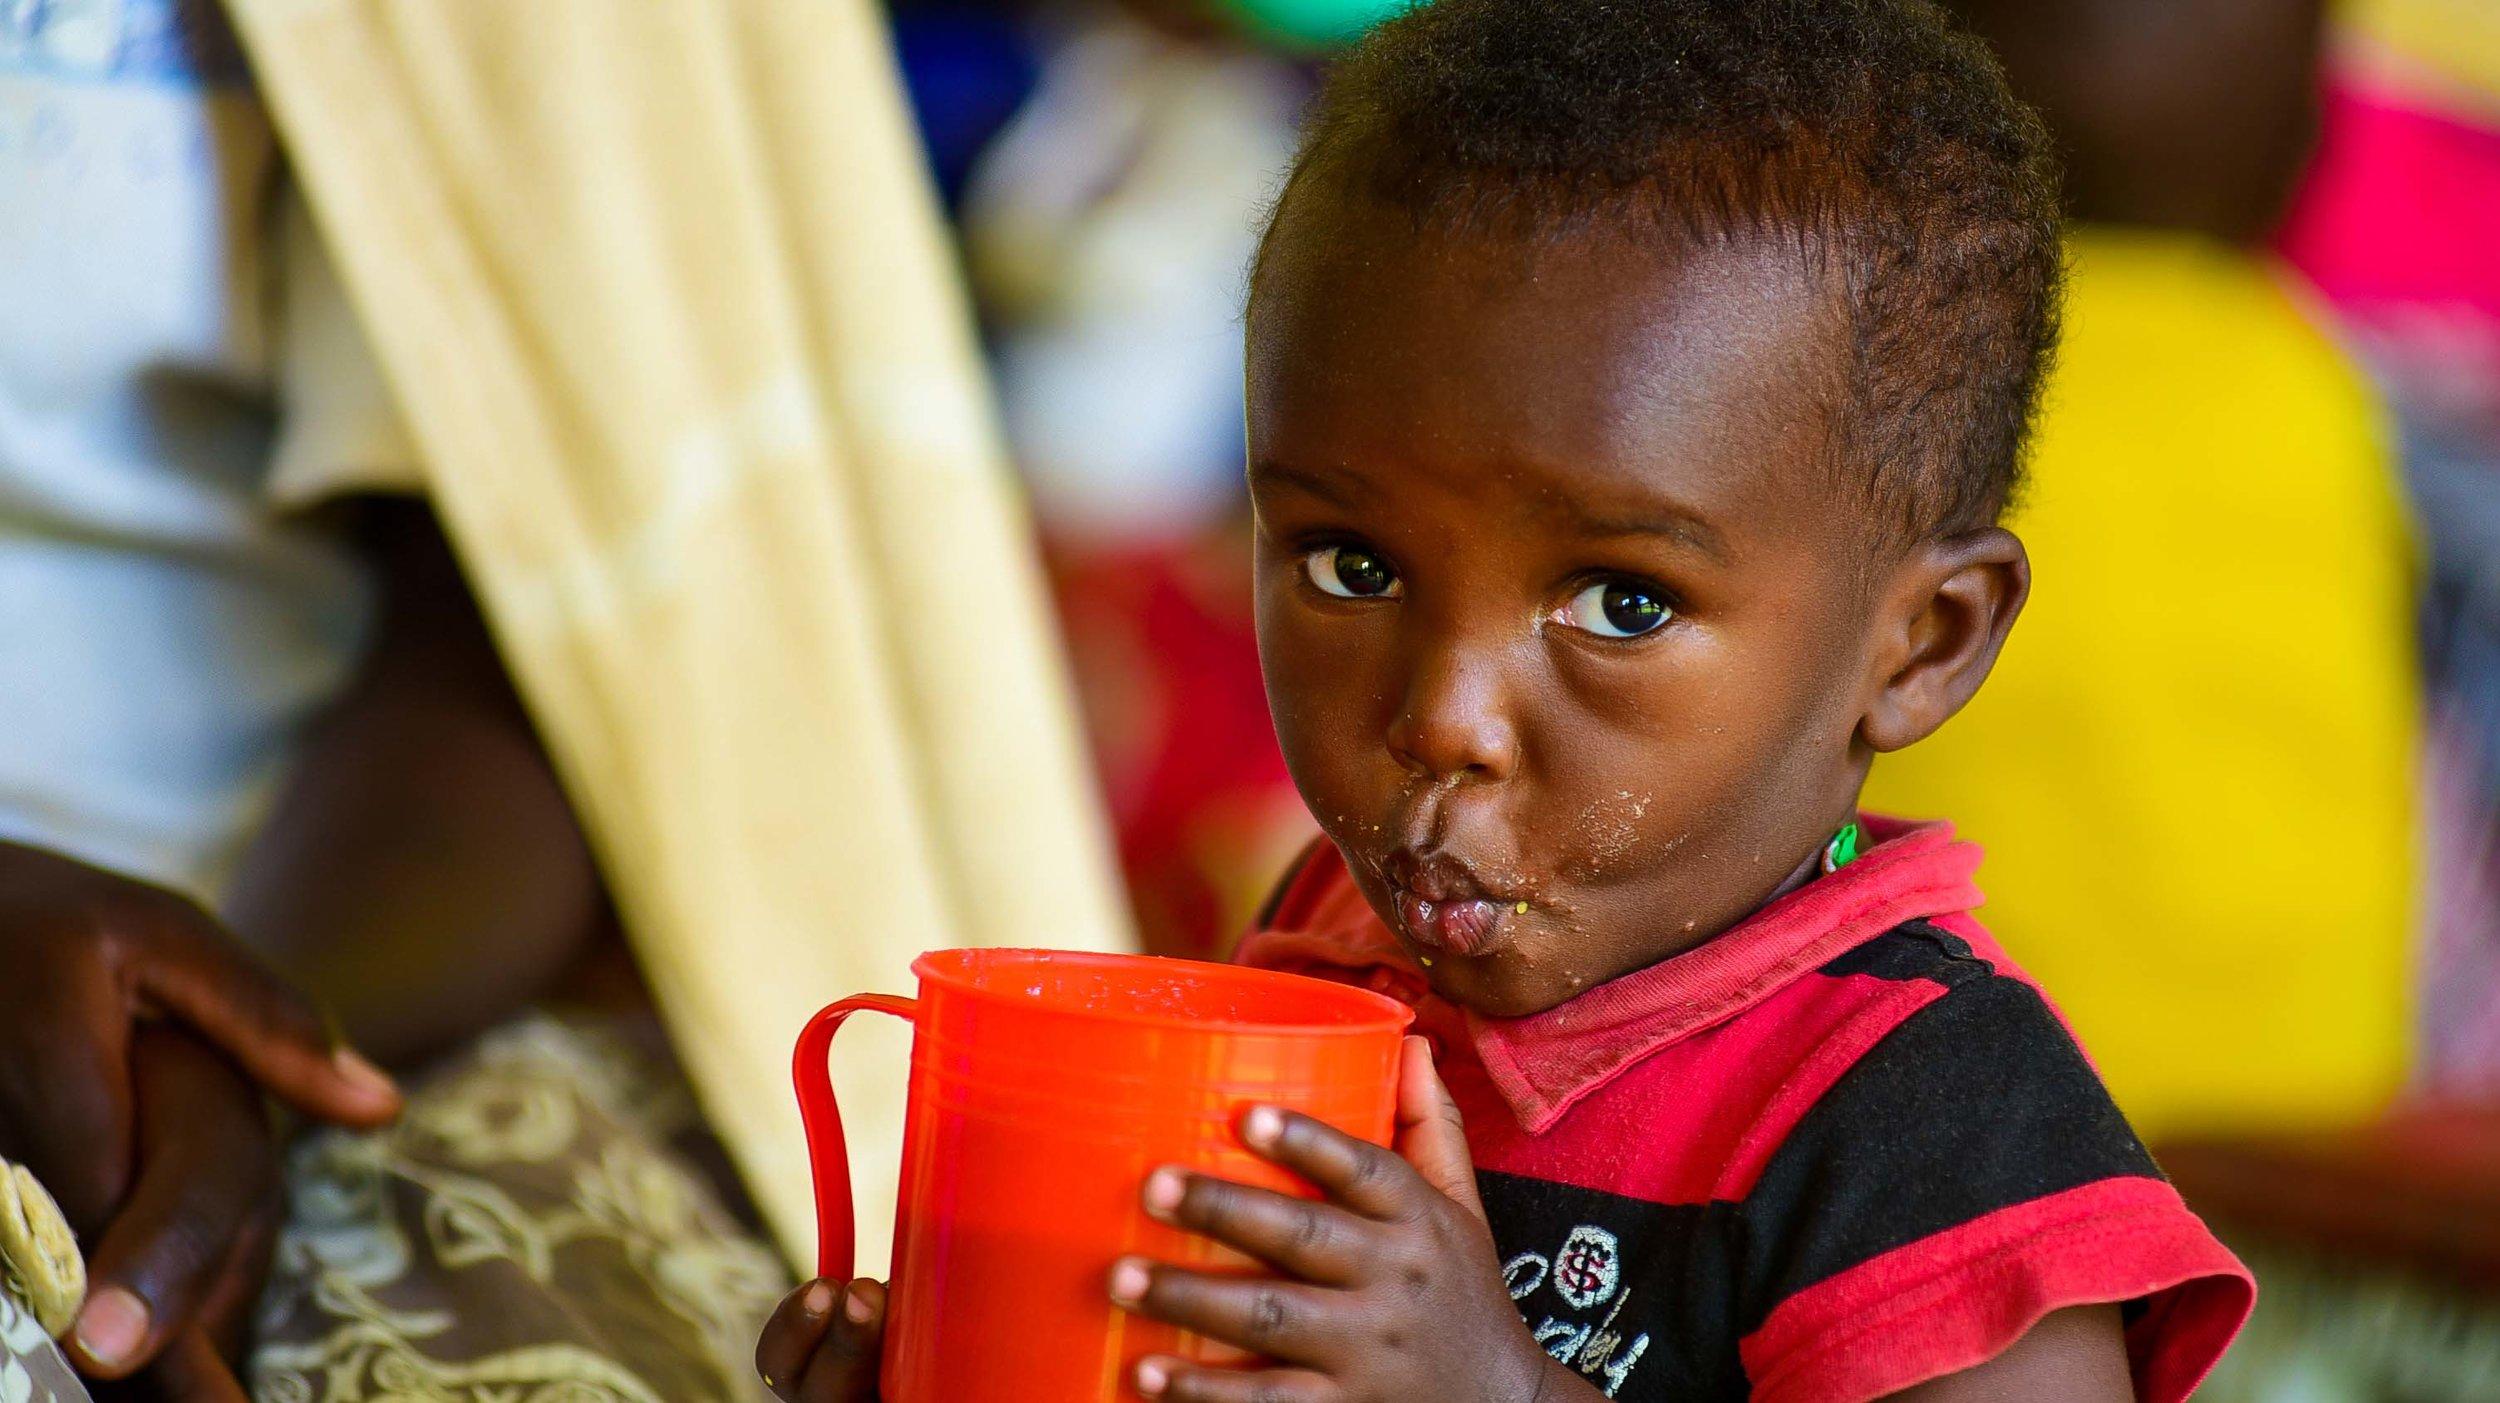 A child drinks Sosoma at a GHI health center training on family planning at the Gataraga Health Center in Musanze, Rwanda.